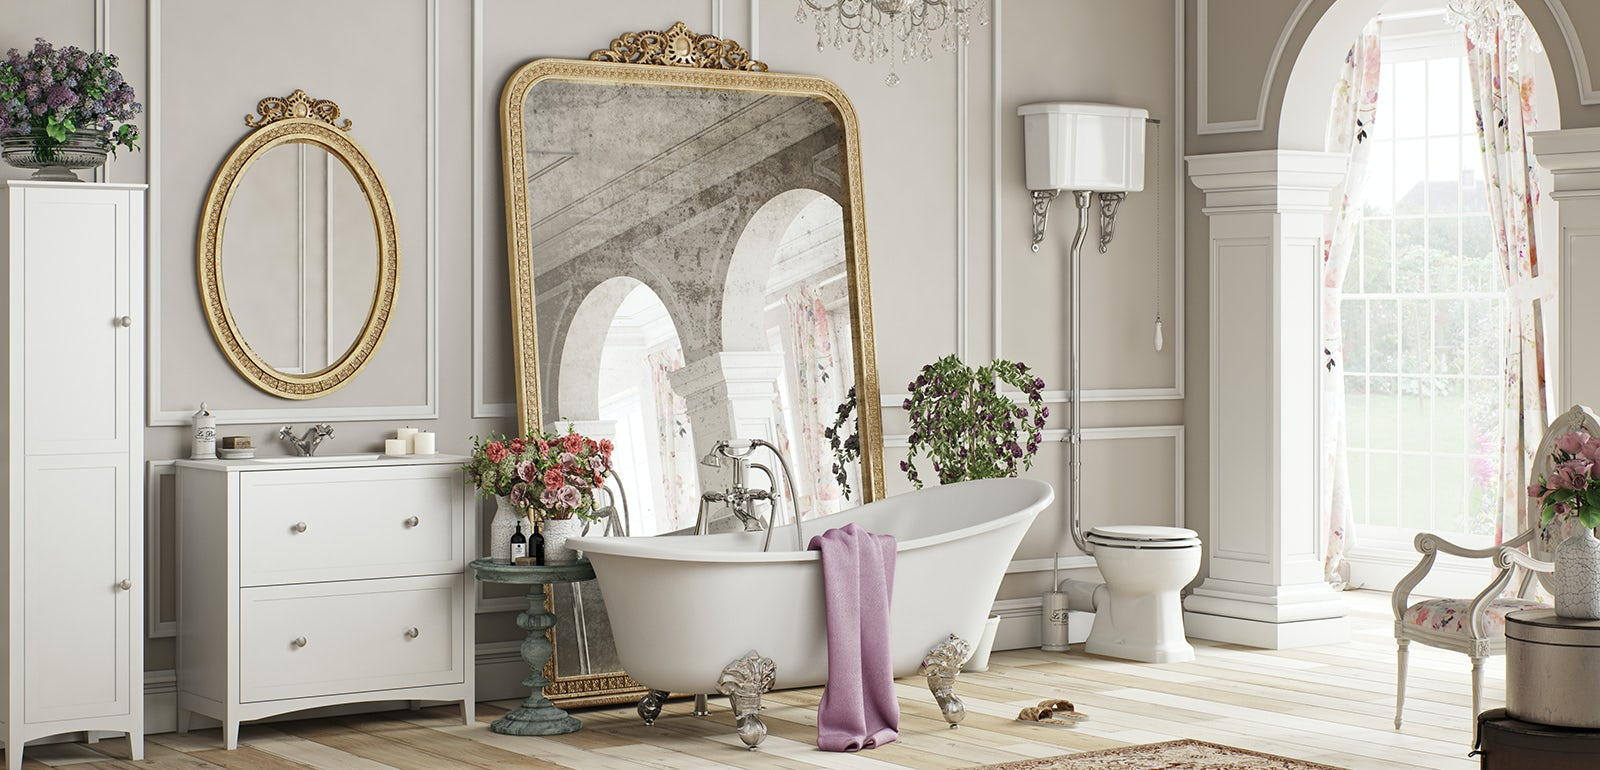 Bathroom Ideas: Create a Mexican-inspired bathroom | VictoriaPlum.com